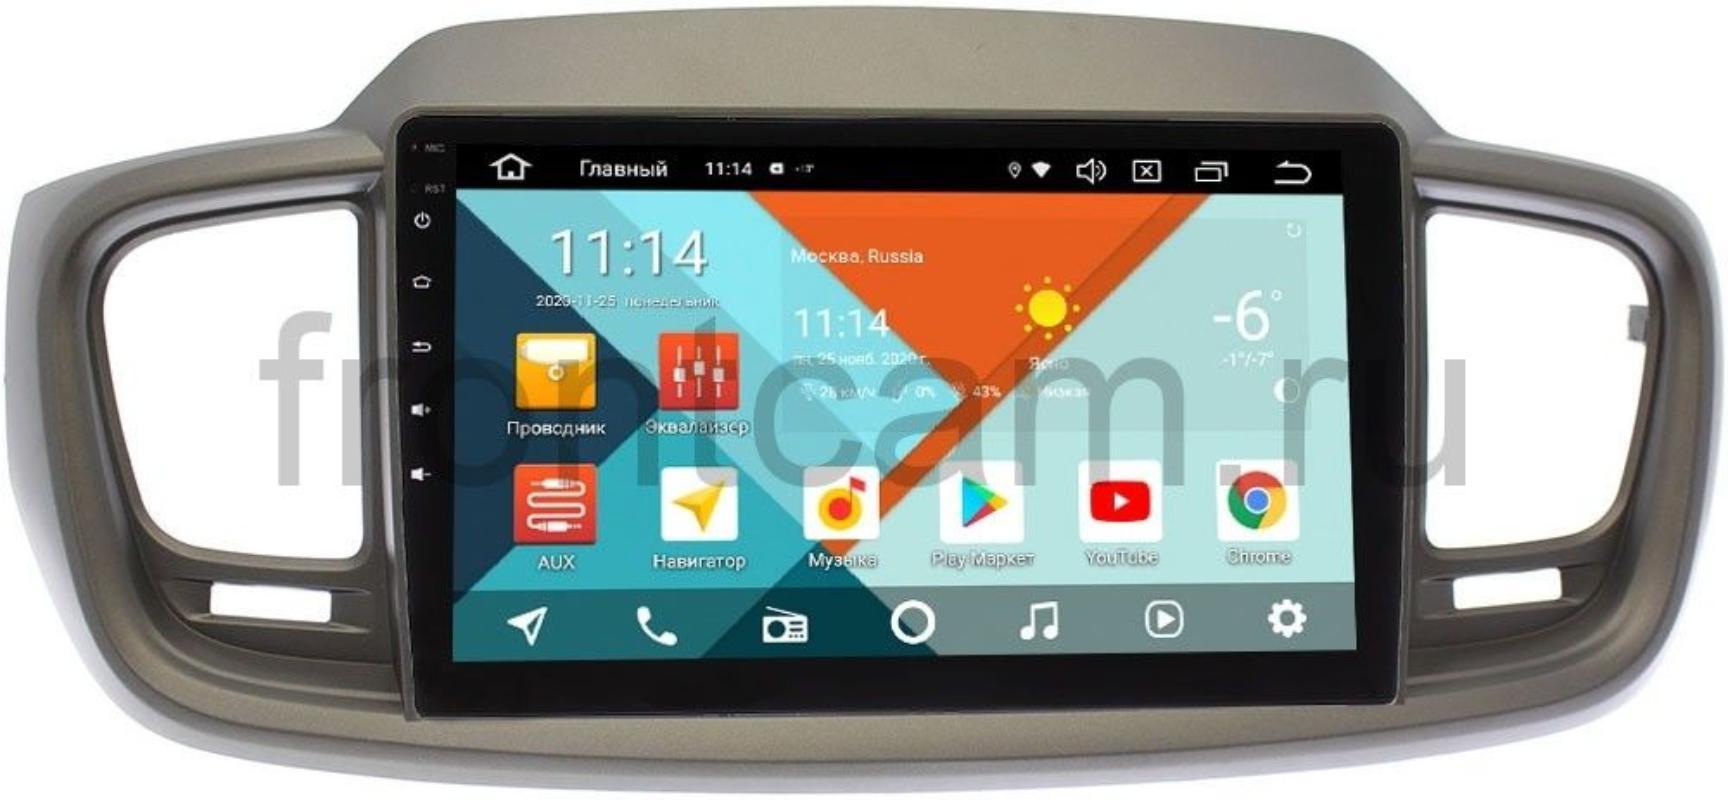 Штатная магнитола Kia Sorento III Prime Wide Media KS1125QR-3/32 DSP CarPlay 4G-SIM на Android 10 (+ Камера заднего вида в подарок!)